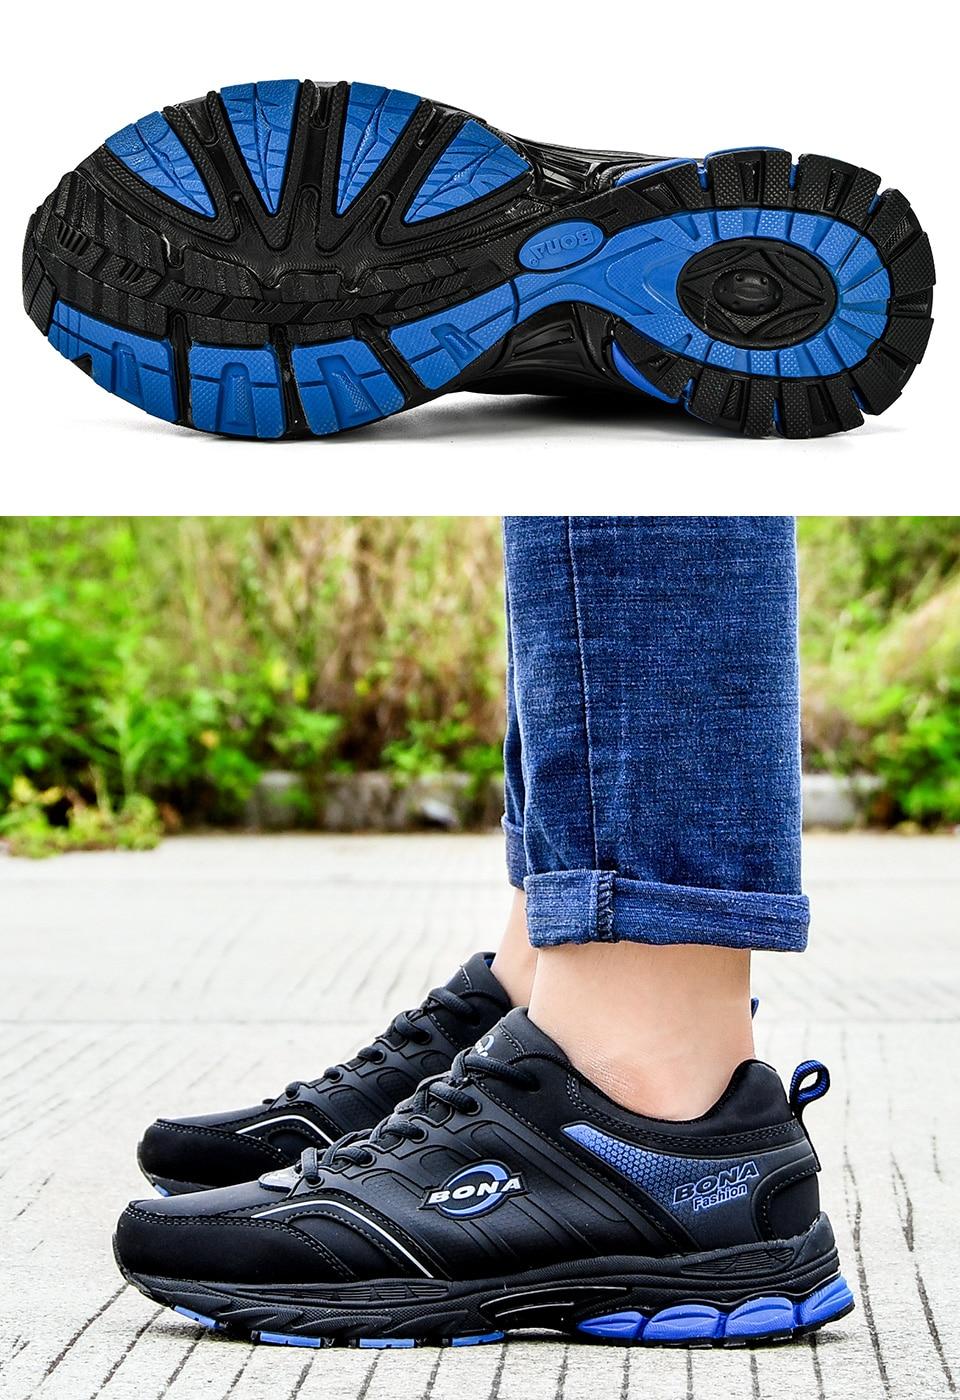 HTB1Tm5BBZyYBuNkSnfoq6AWgVXaY BONA Men Casual Shoes Microfiber Man Flats Lace Up Breathable Men Fashion Classic Outdoor Shoes Zapatos De Hombre Free Shipping